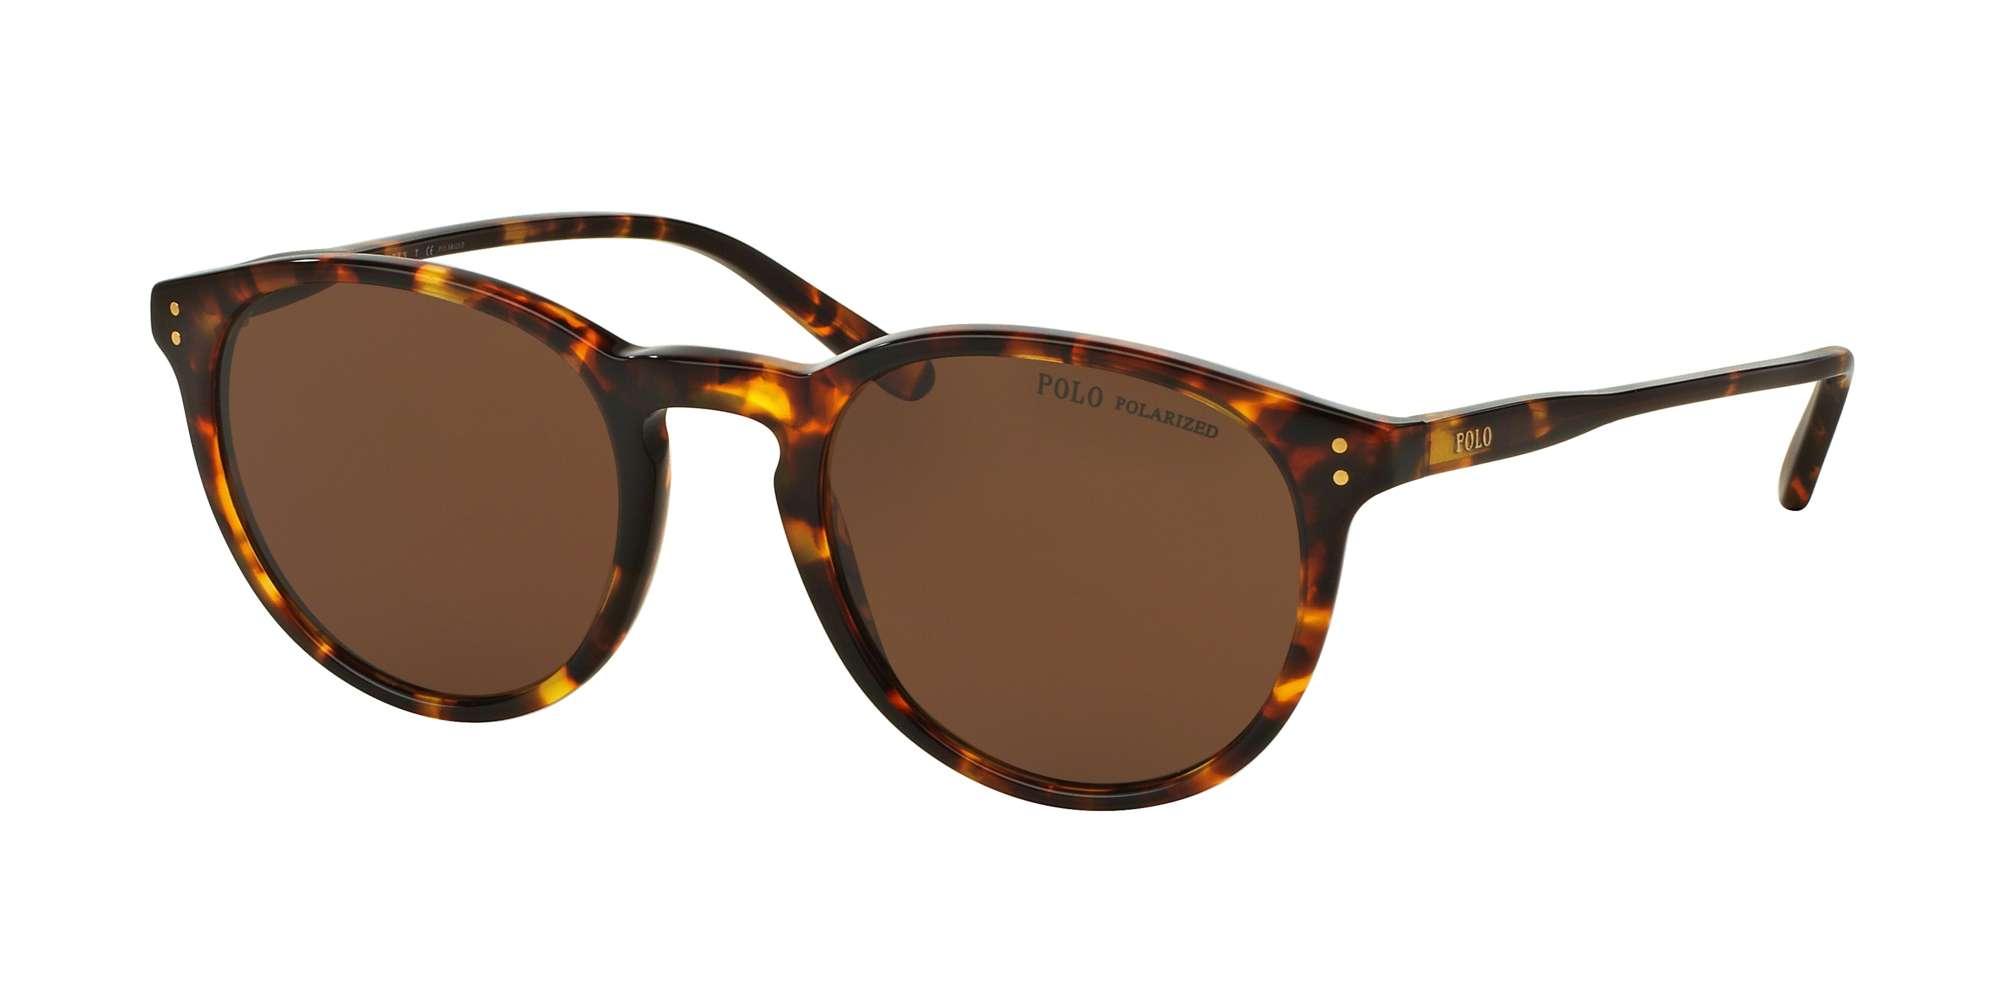 SHINY ANTIQUE HAVANA / POLAR BROWN lenses